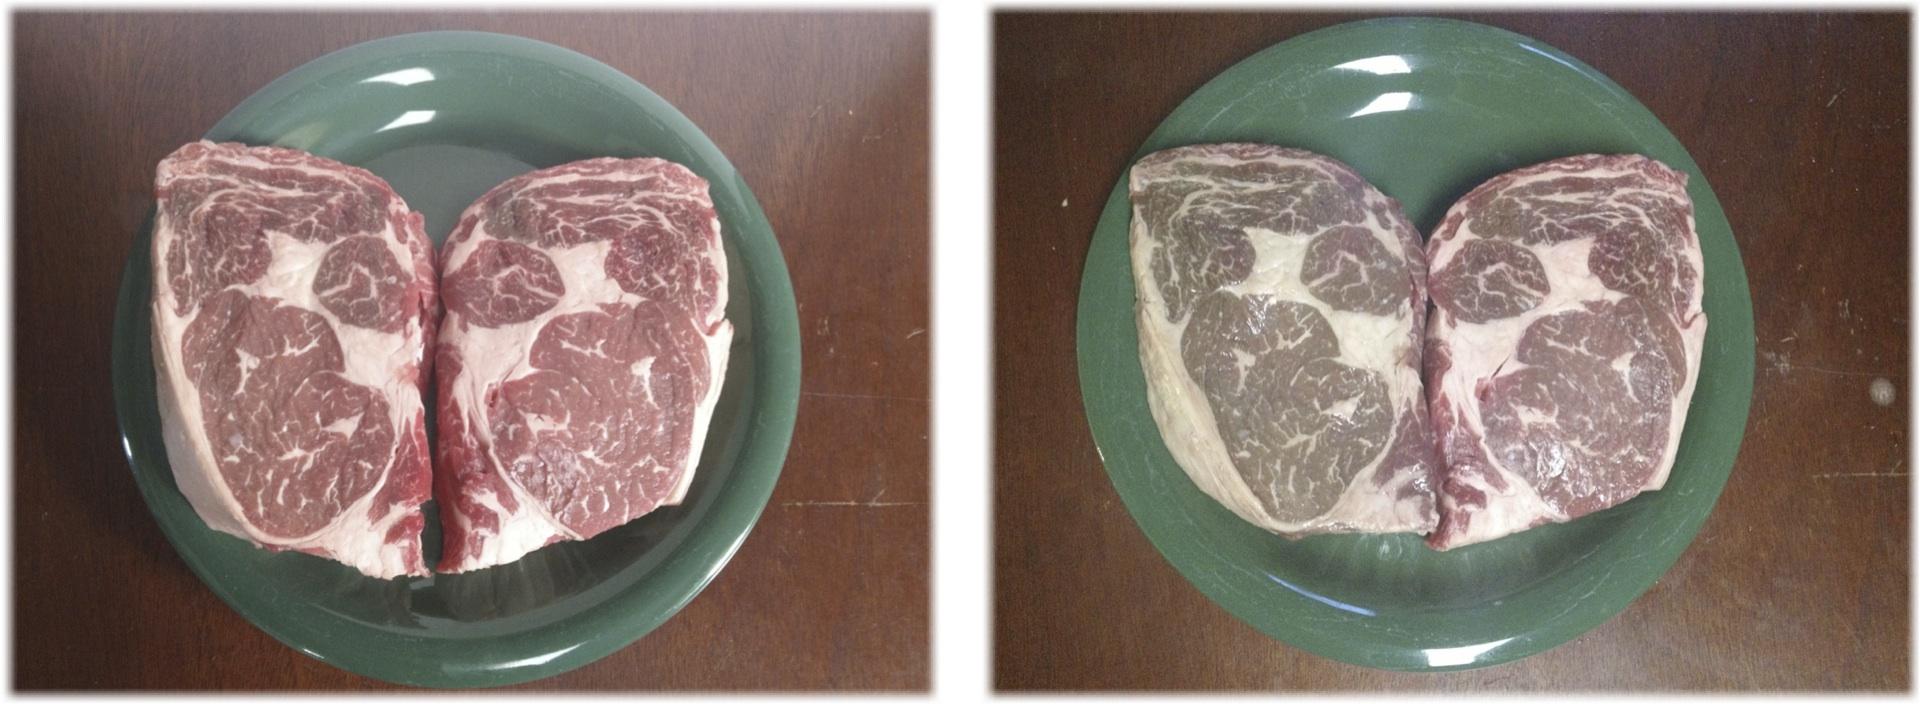 Fresh Vs Frozen Steak Revisited Doing Science To Stuff